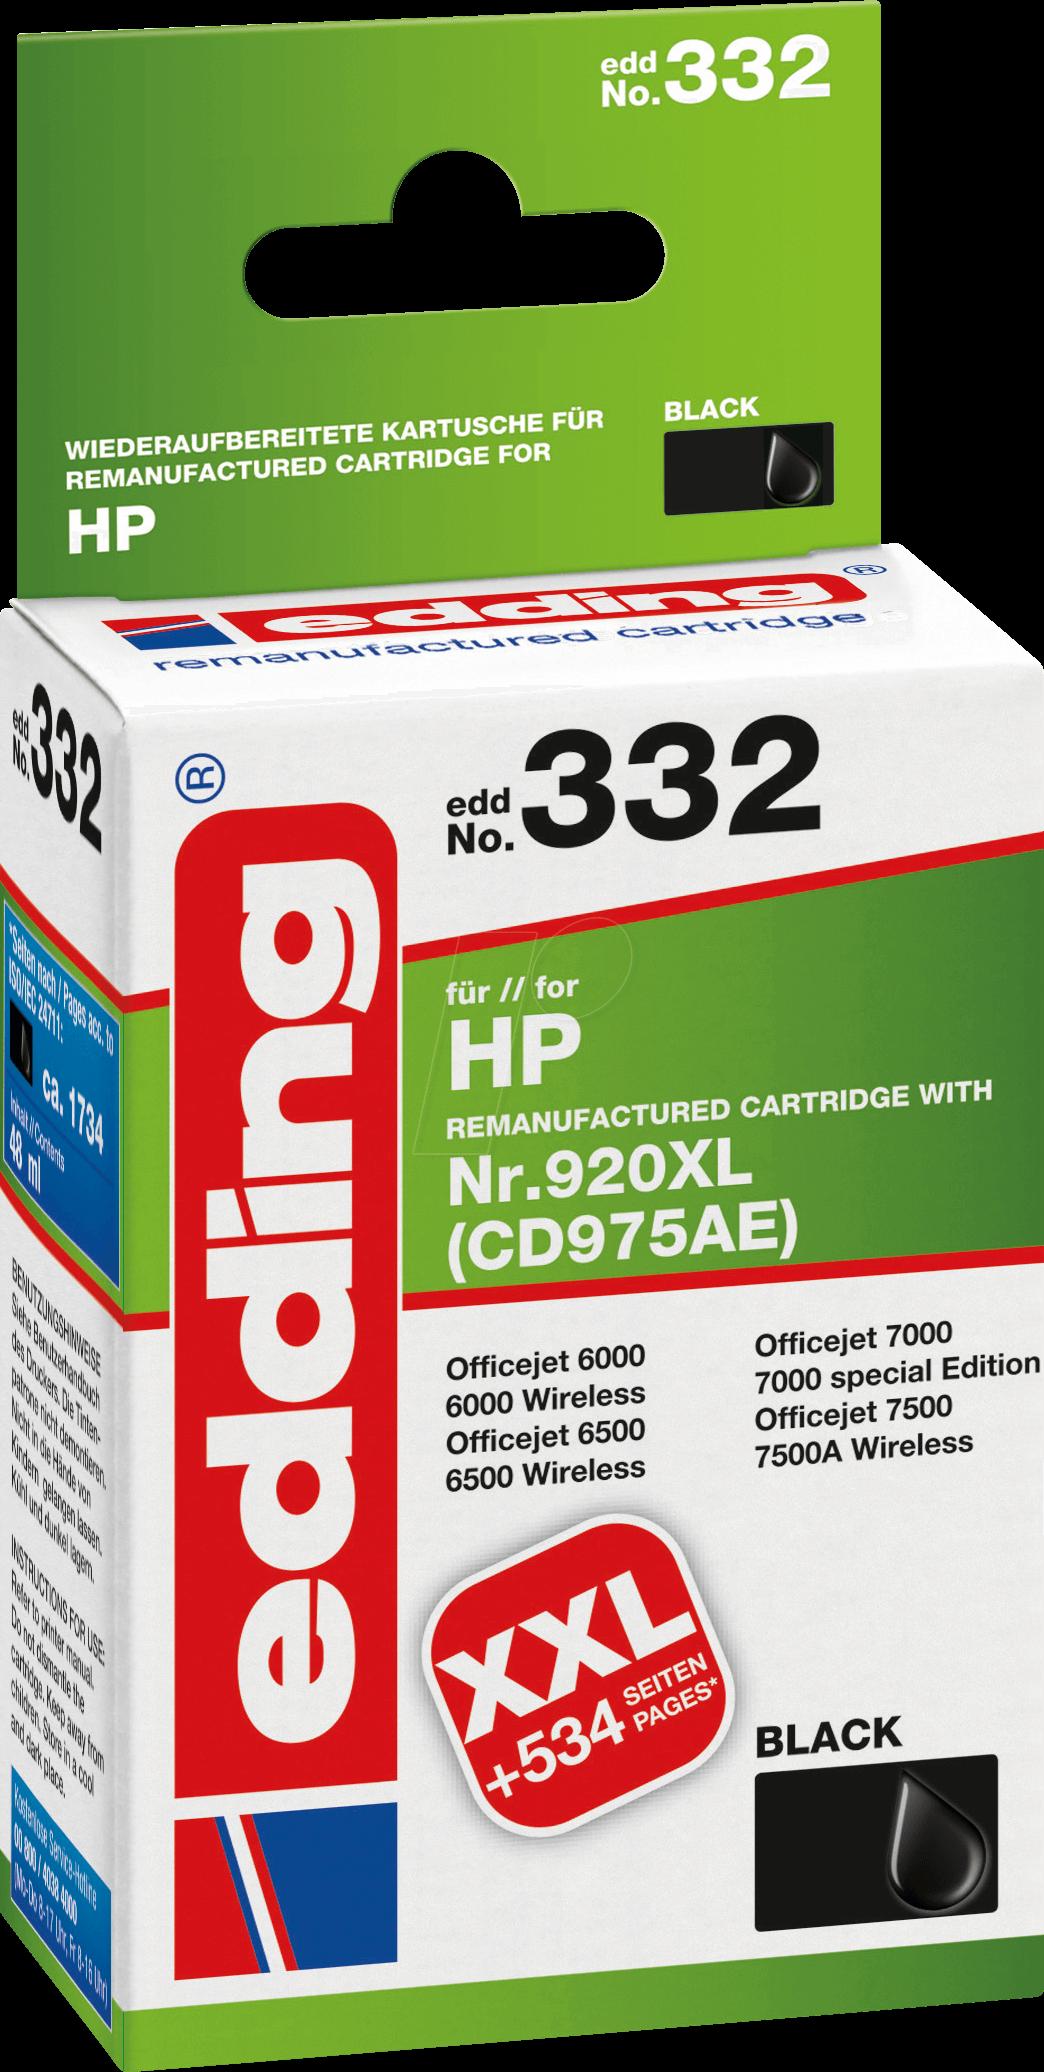 EDDING EDD-332 - Tinte - HP - schwarz - HP920XL...